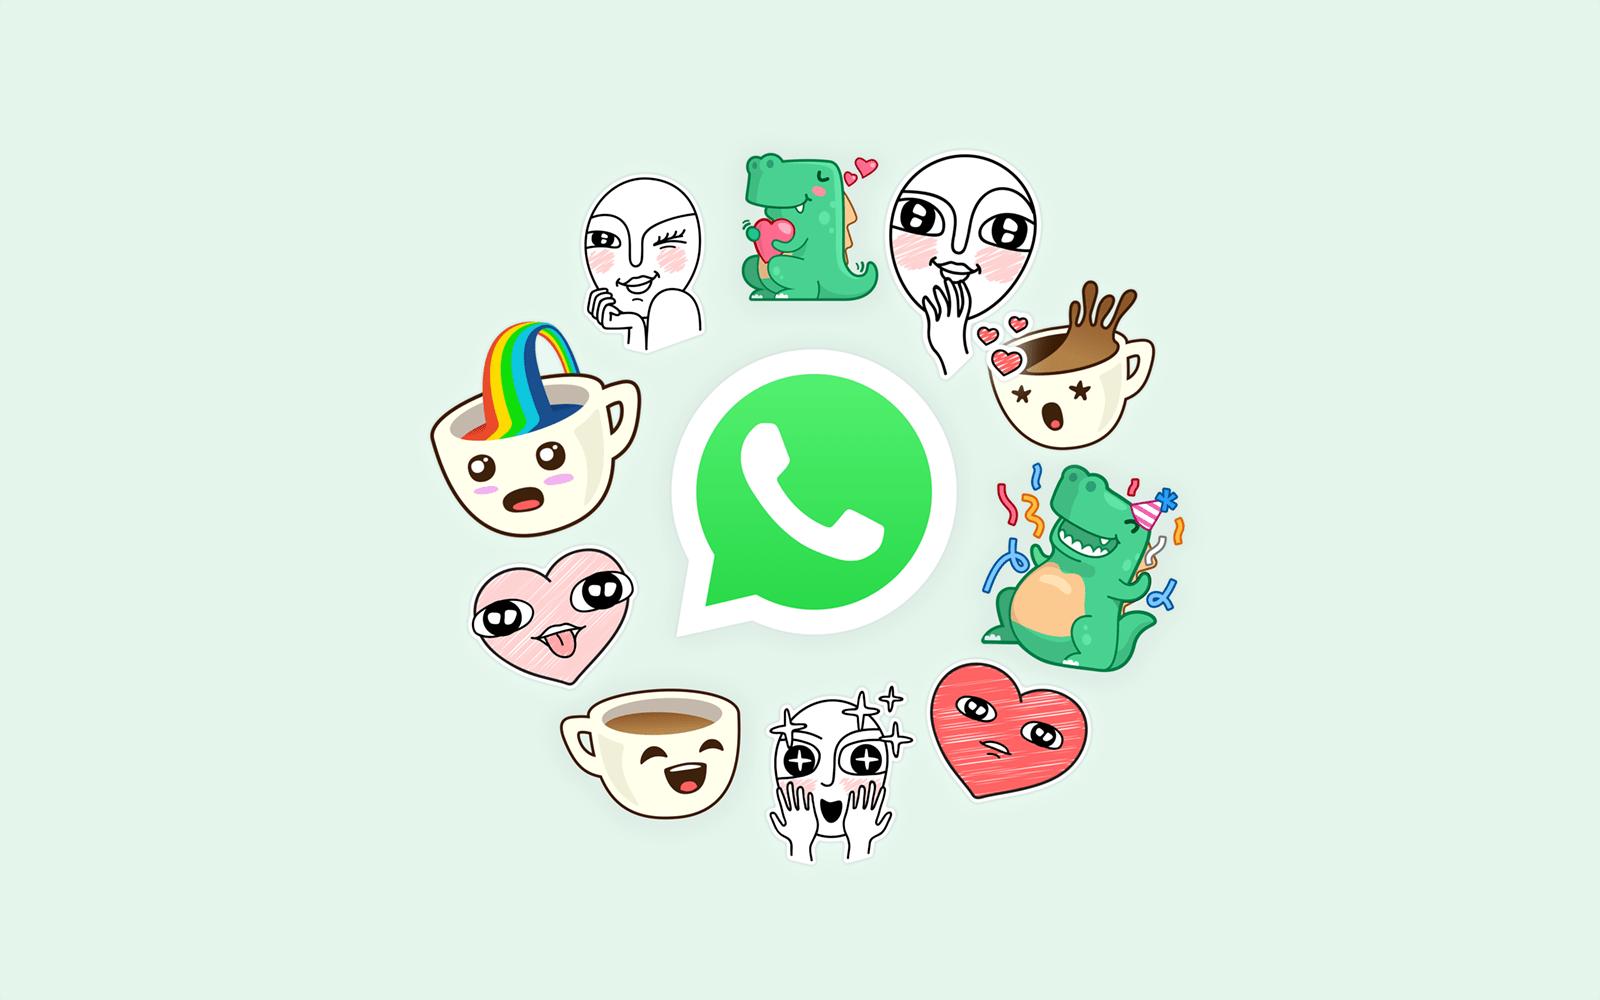 whatsapp update adds stickers